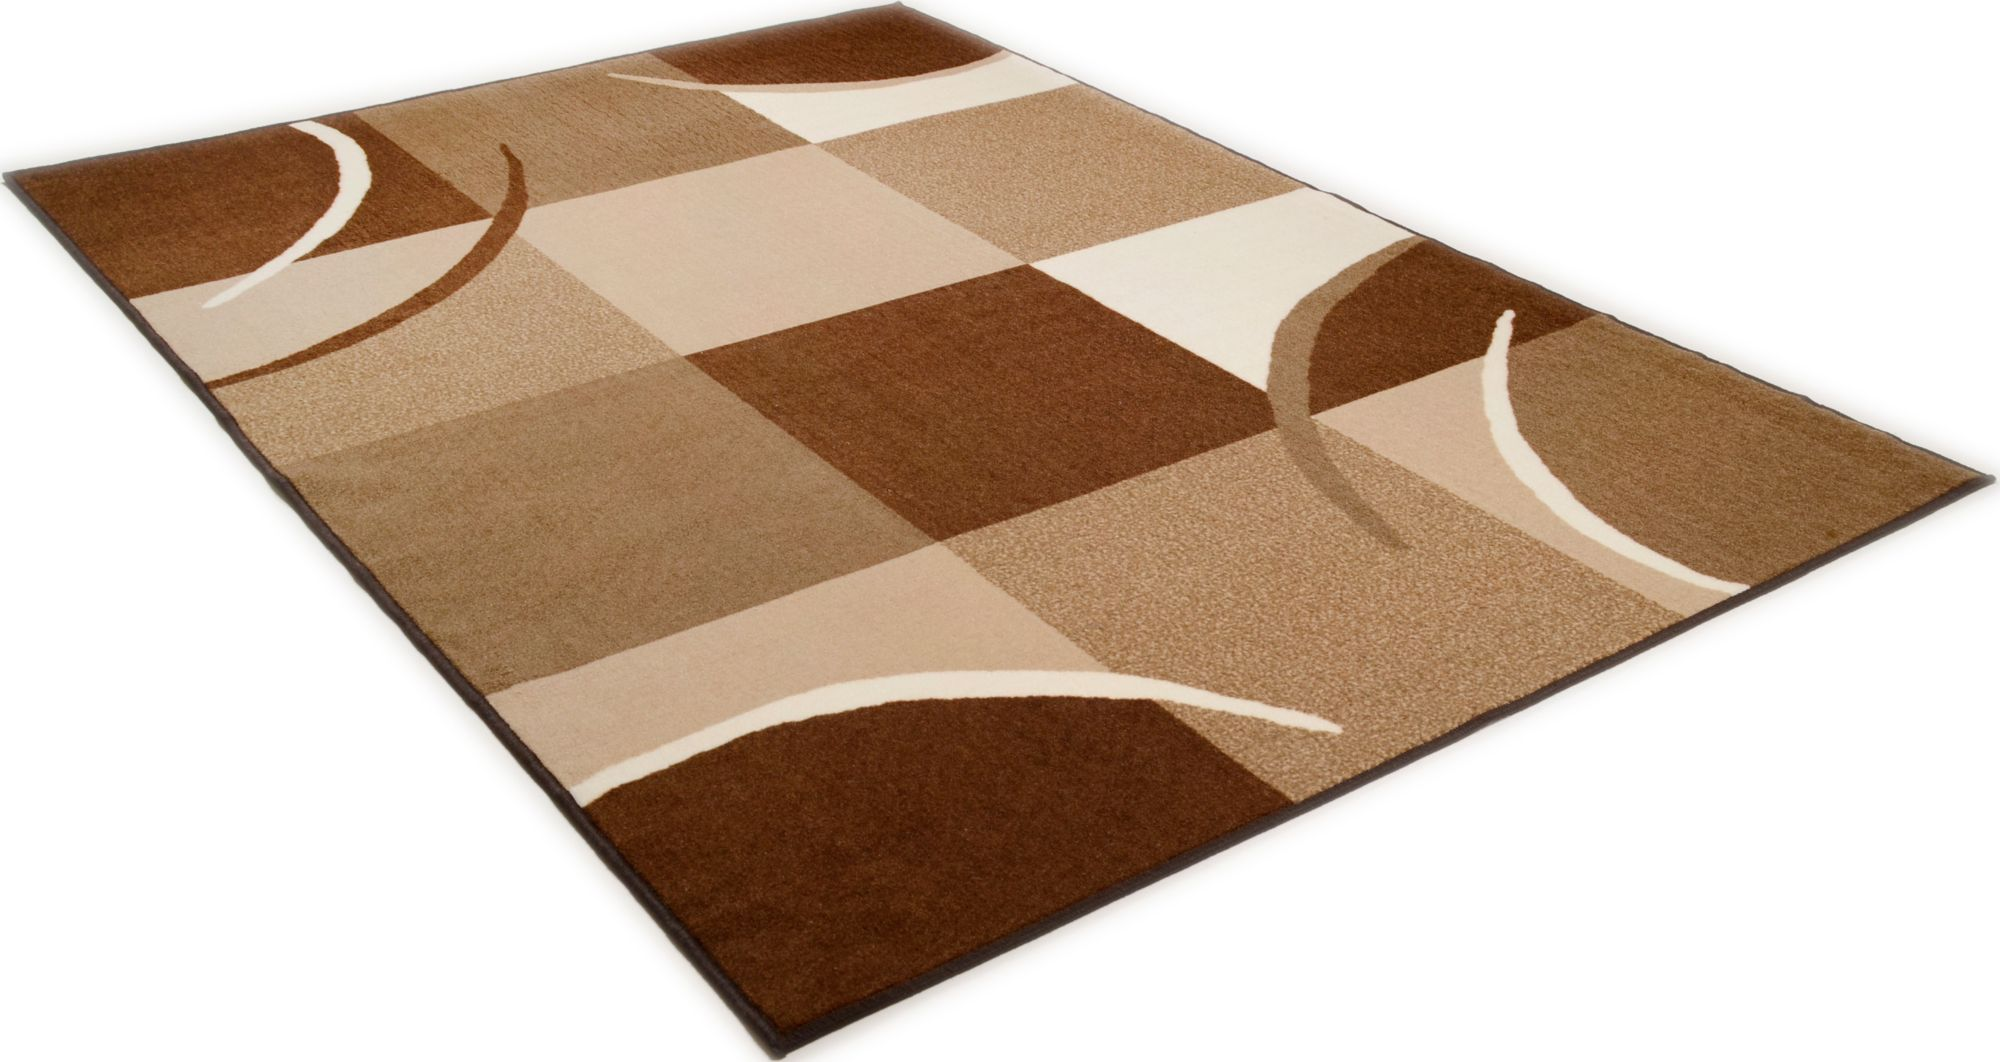 schwab versand. Black Bedroom Furniture Sets. Home Design Ideas